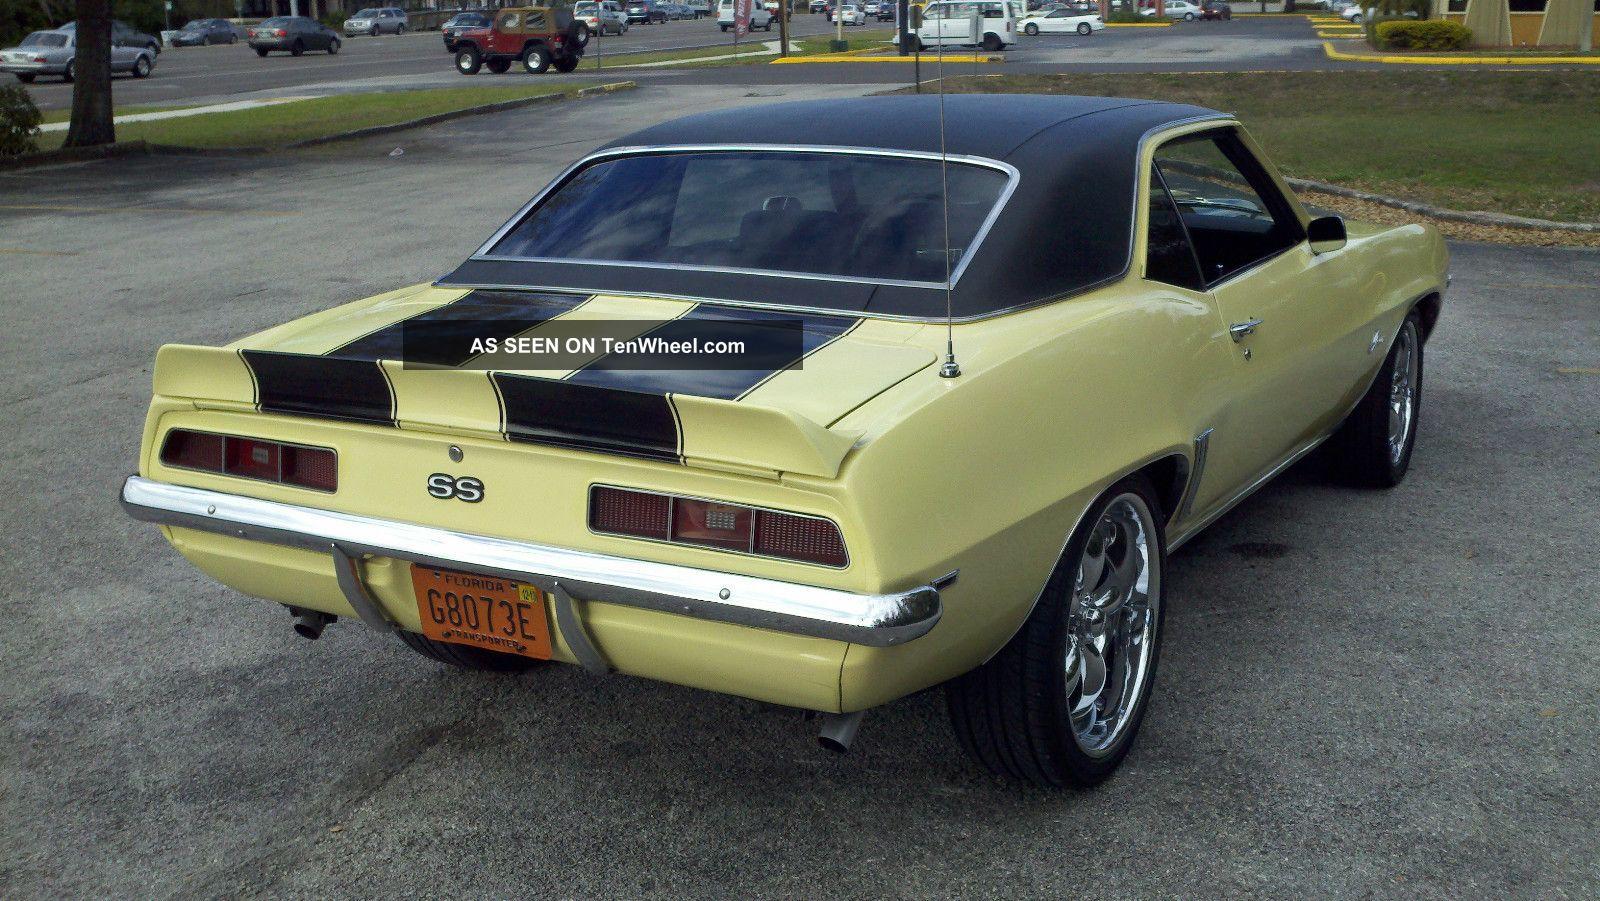 1969 Camaro Ss Camaro photo 9